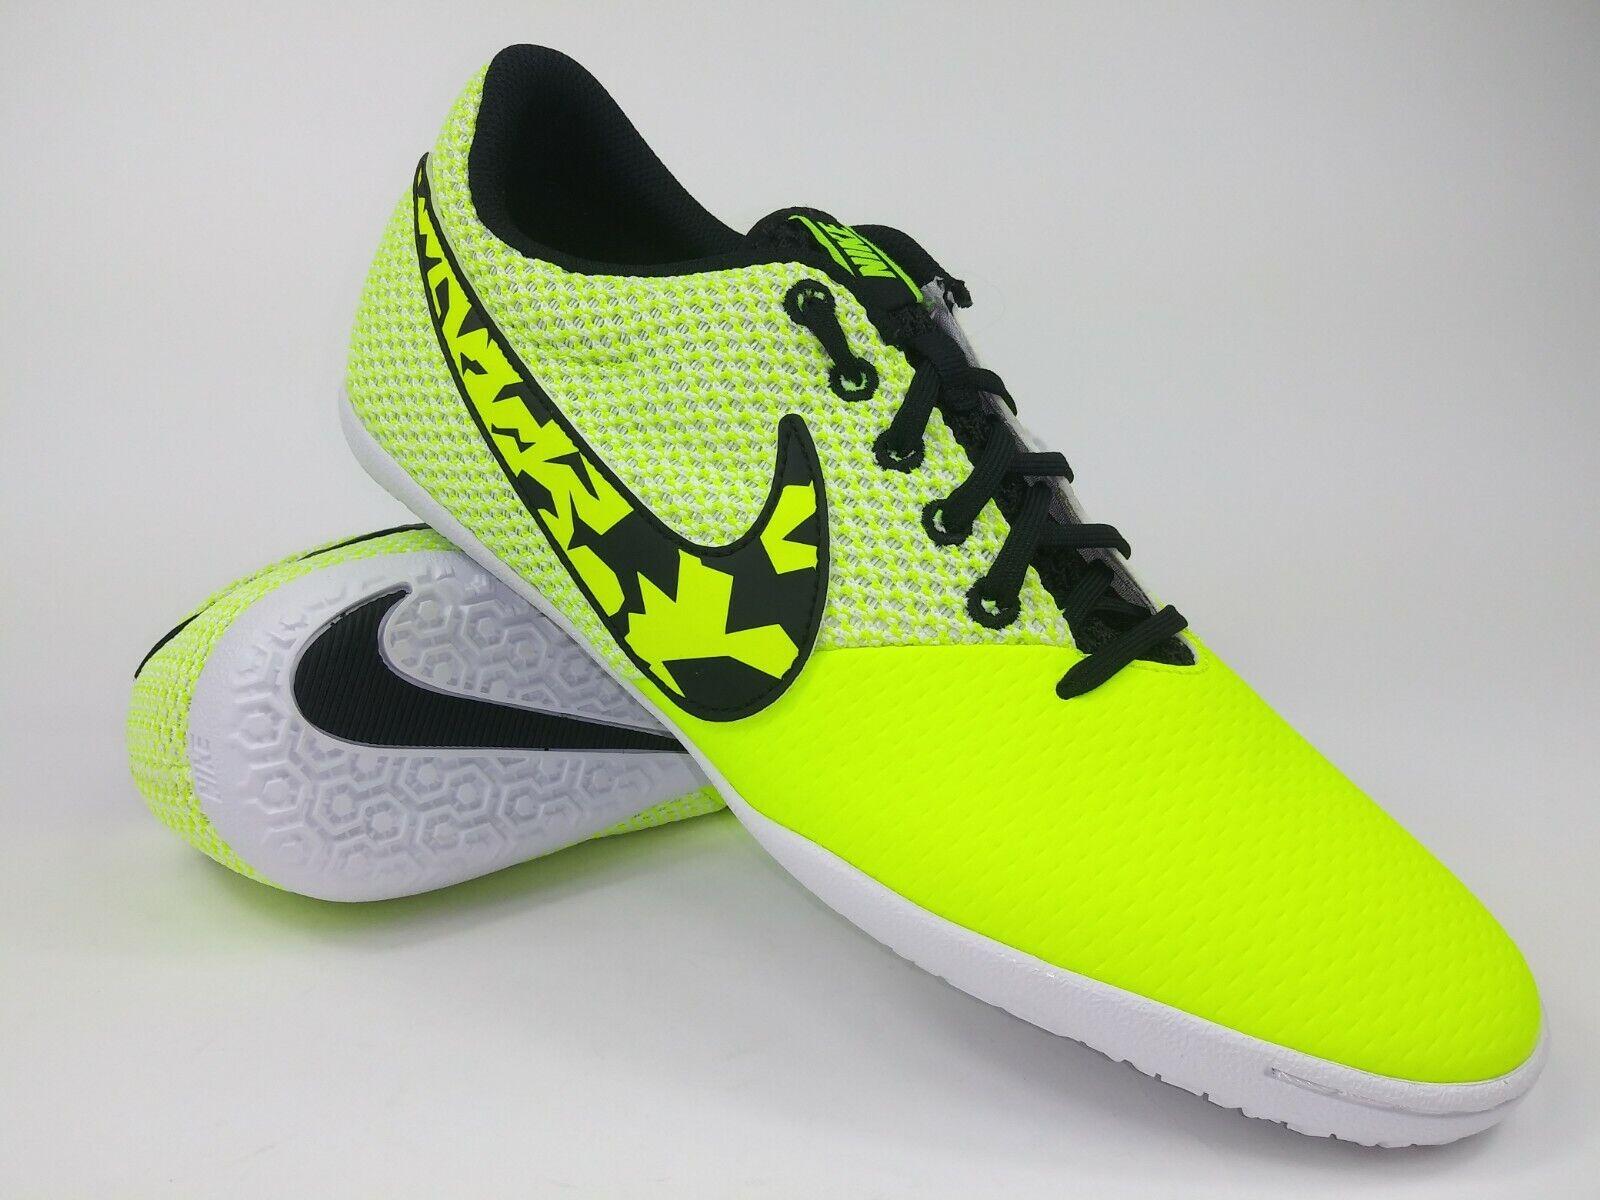 Nike Hombres Raro Elastico Pro Lll IC 685360 701 zapatos de interior amarillo blancoo talla 10.5